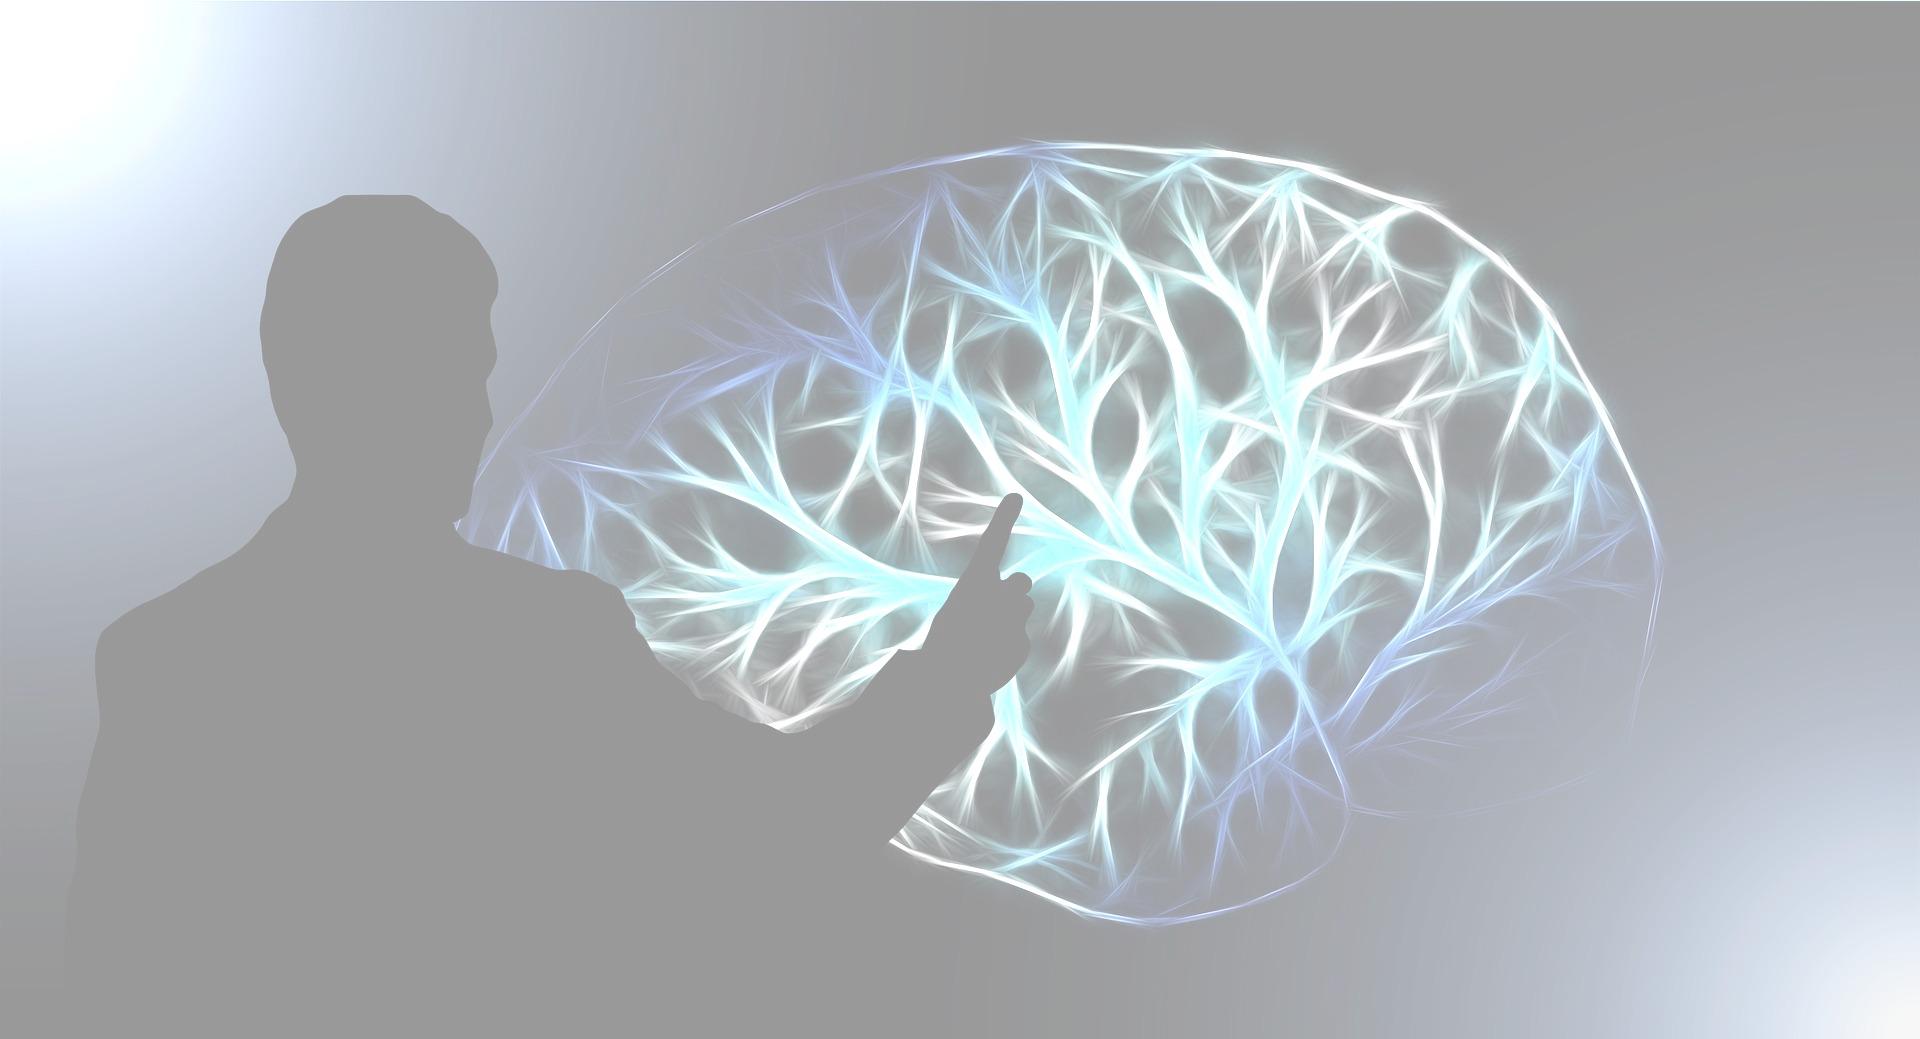 brain-3141247_1920_edited